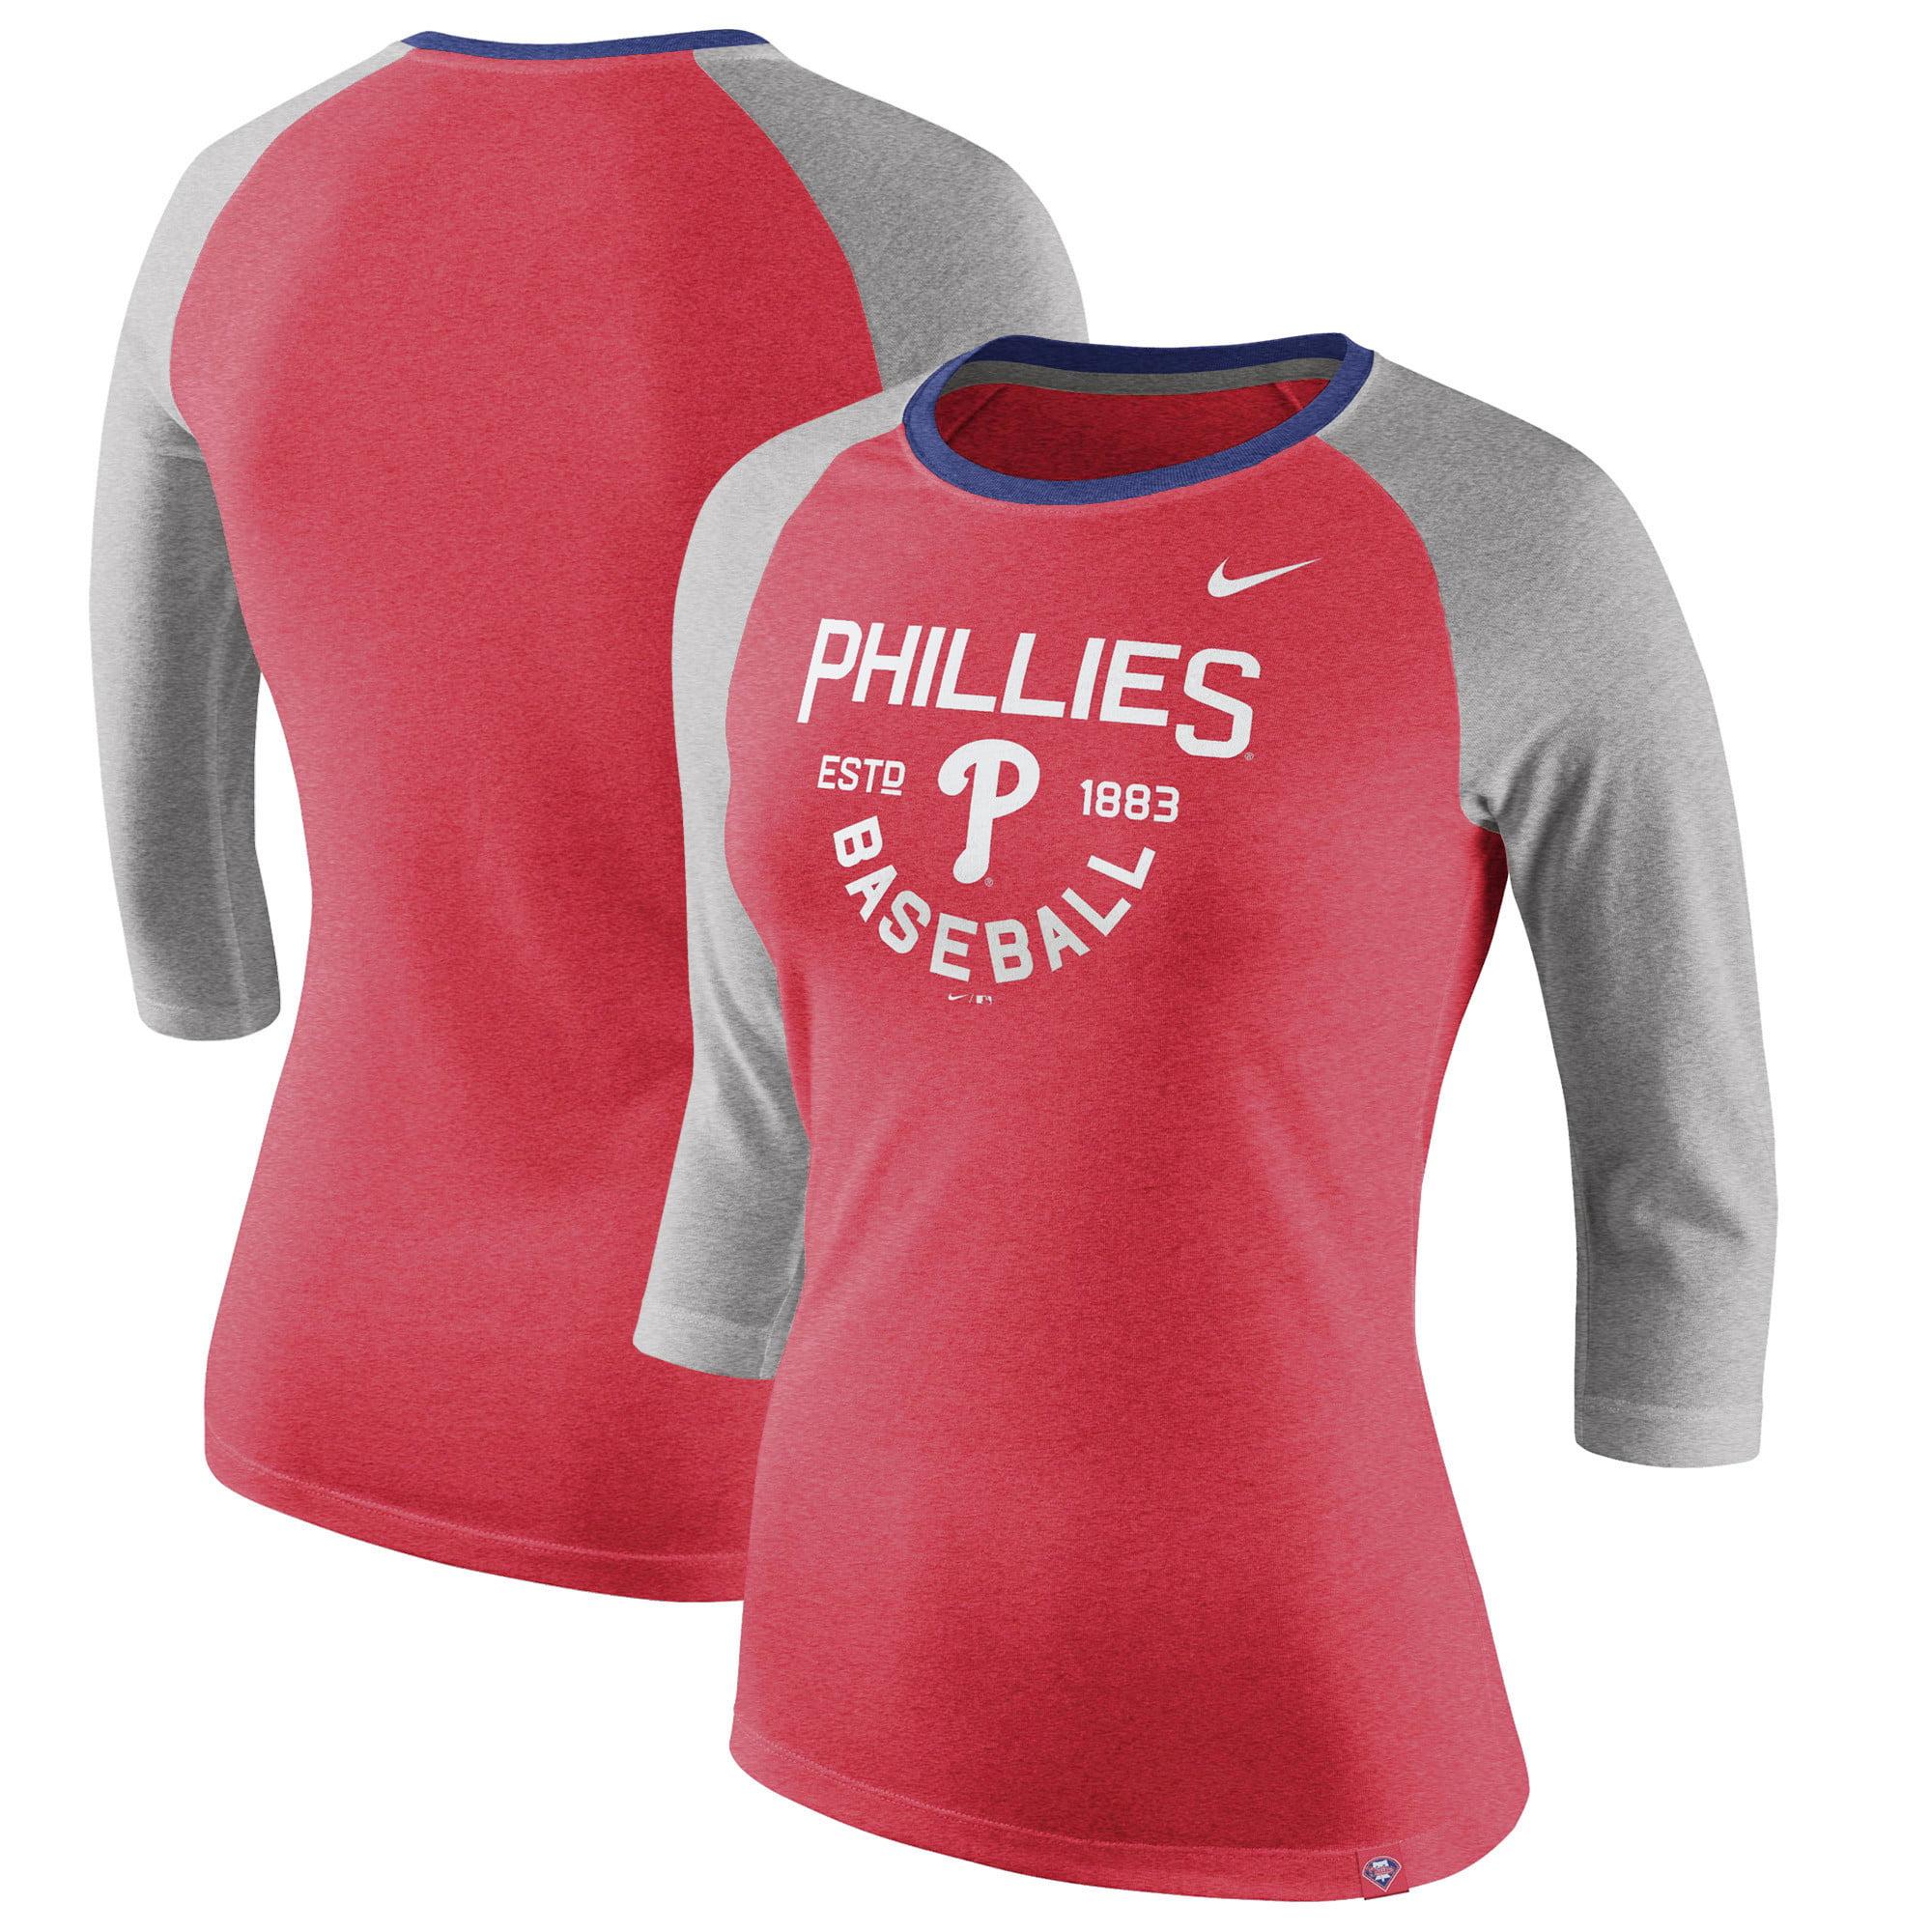 Philadelphia Phillies Nike Women's Tri-Blend Raglan 3/4-Sleeve T-Shirt - Heathered Red